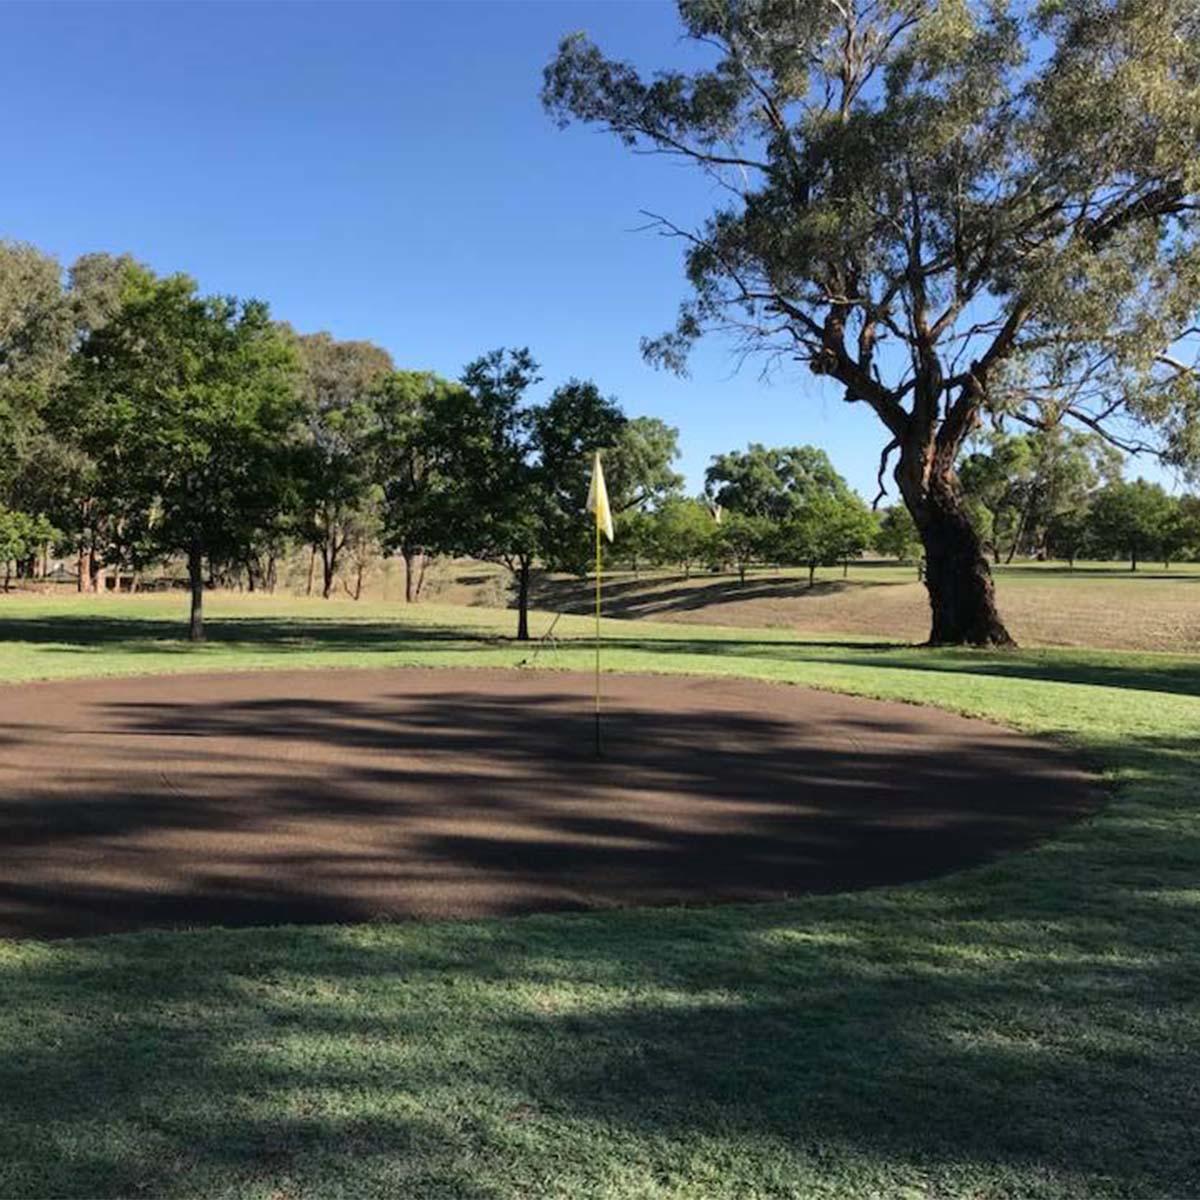 scene of Barraba Golf Club